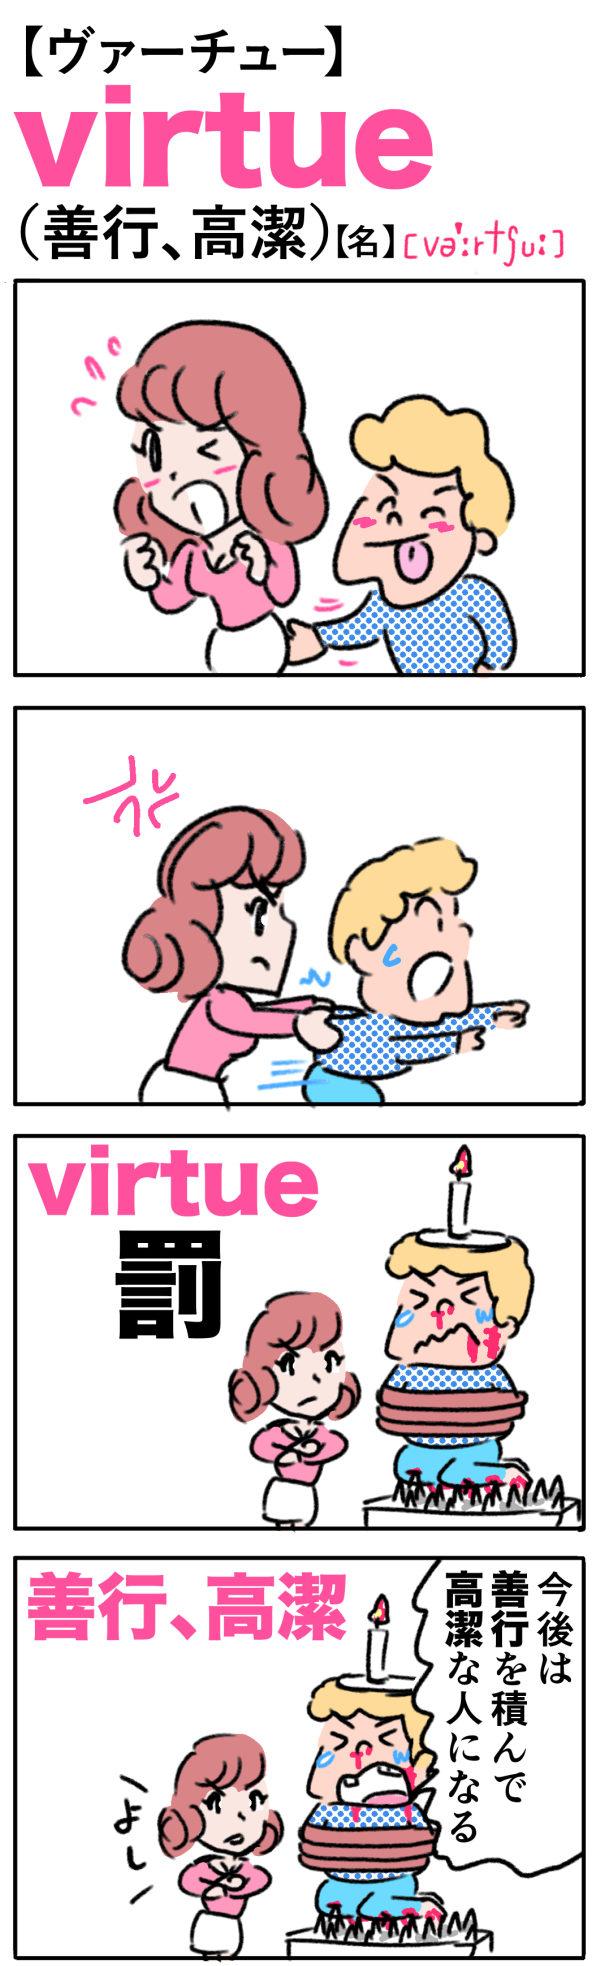 virtue(善行、高潔)の語呂合わせ英単語